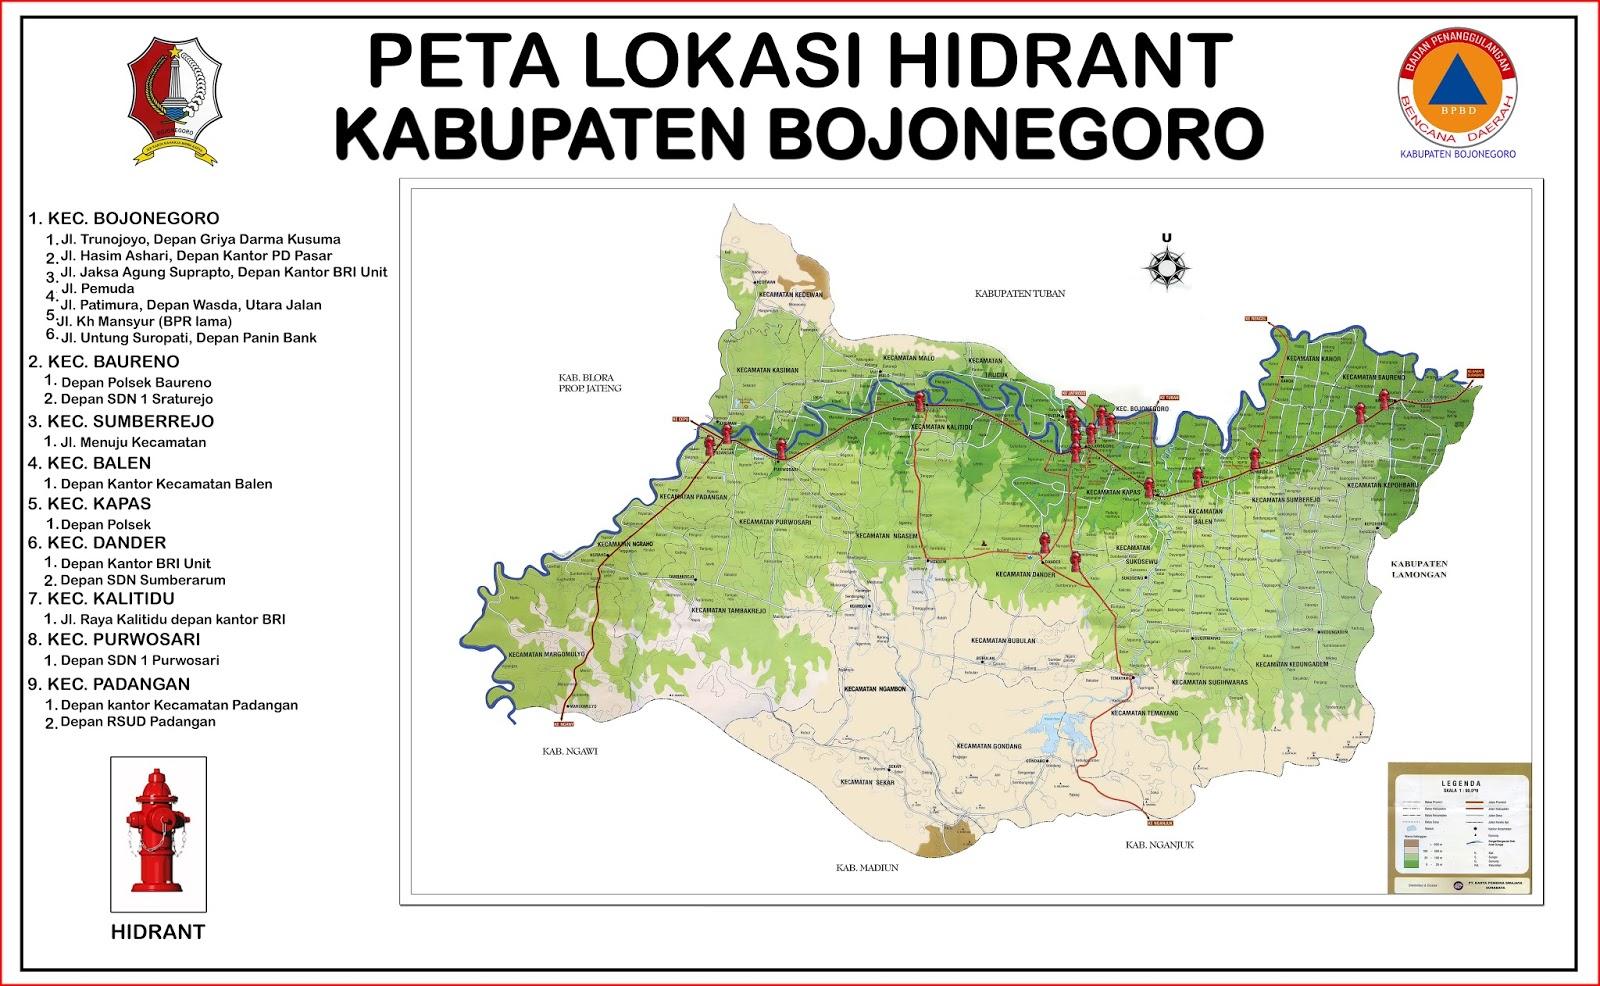 Blog mhey geje peta lokasi hidrant di kabupaten bojonegoro